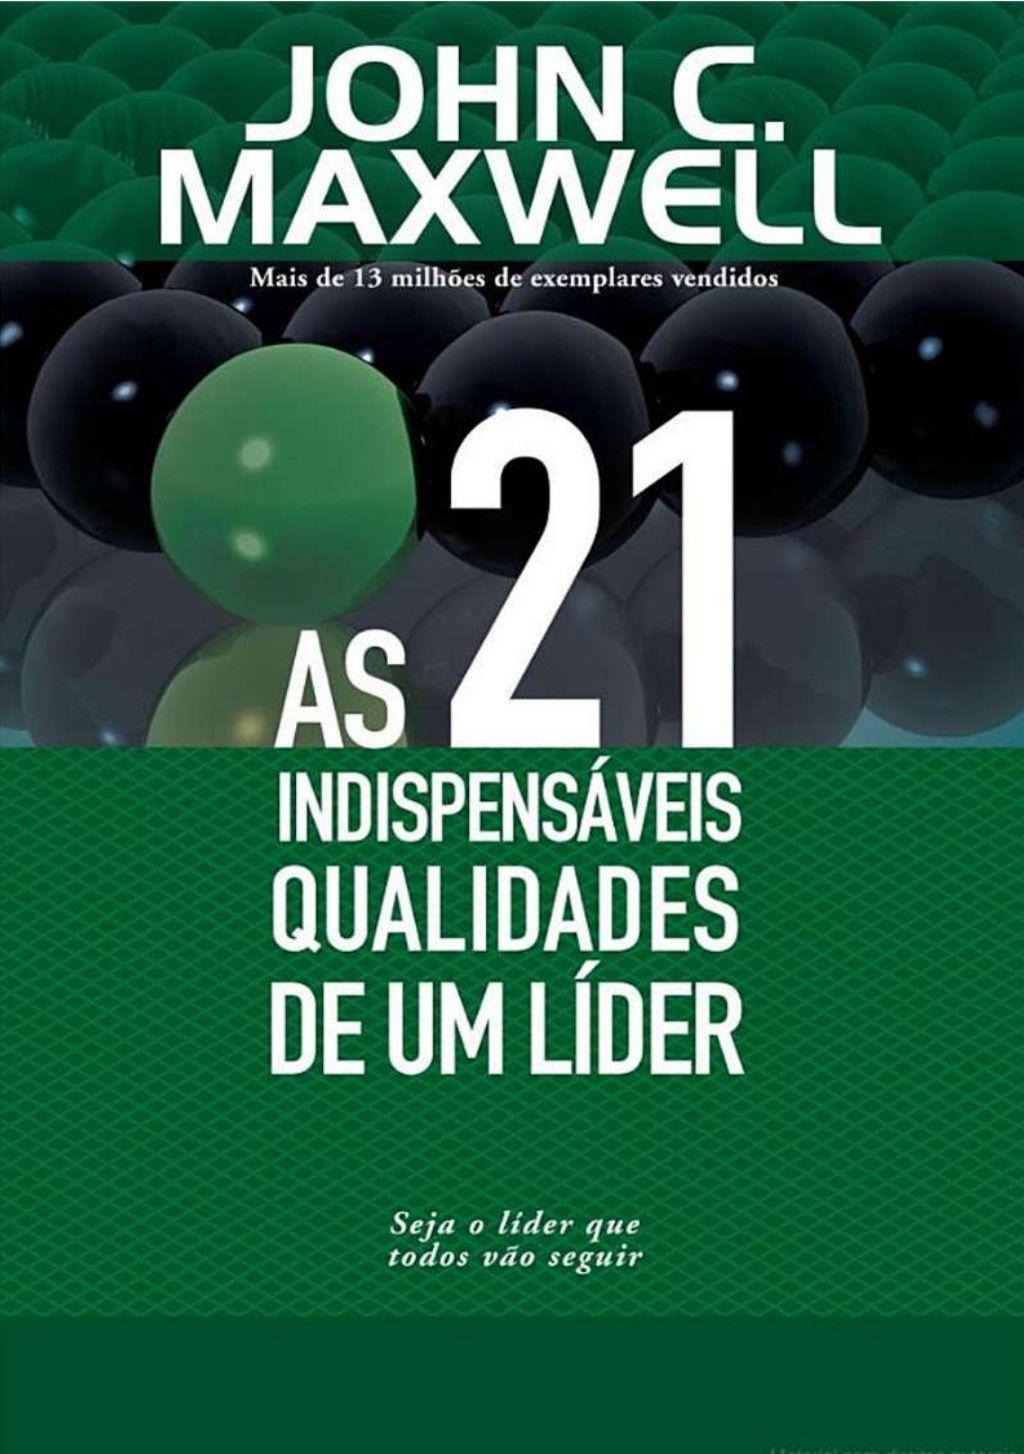 As 21 Indispensaveis Qualidades De Um Lider John C Maxwell By